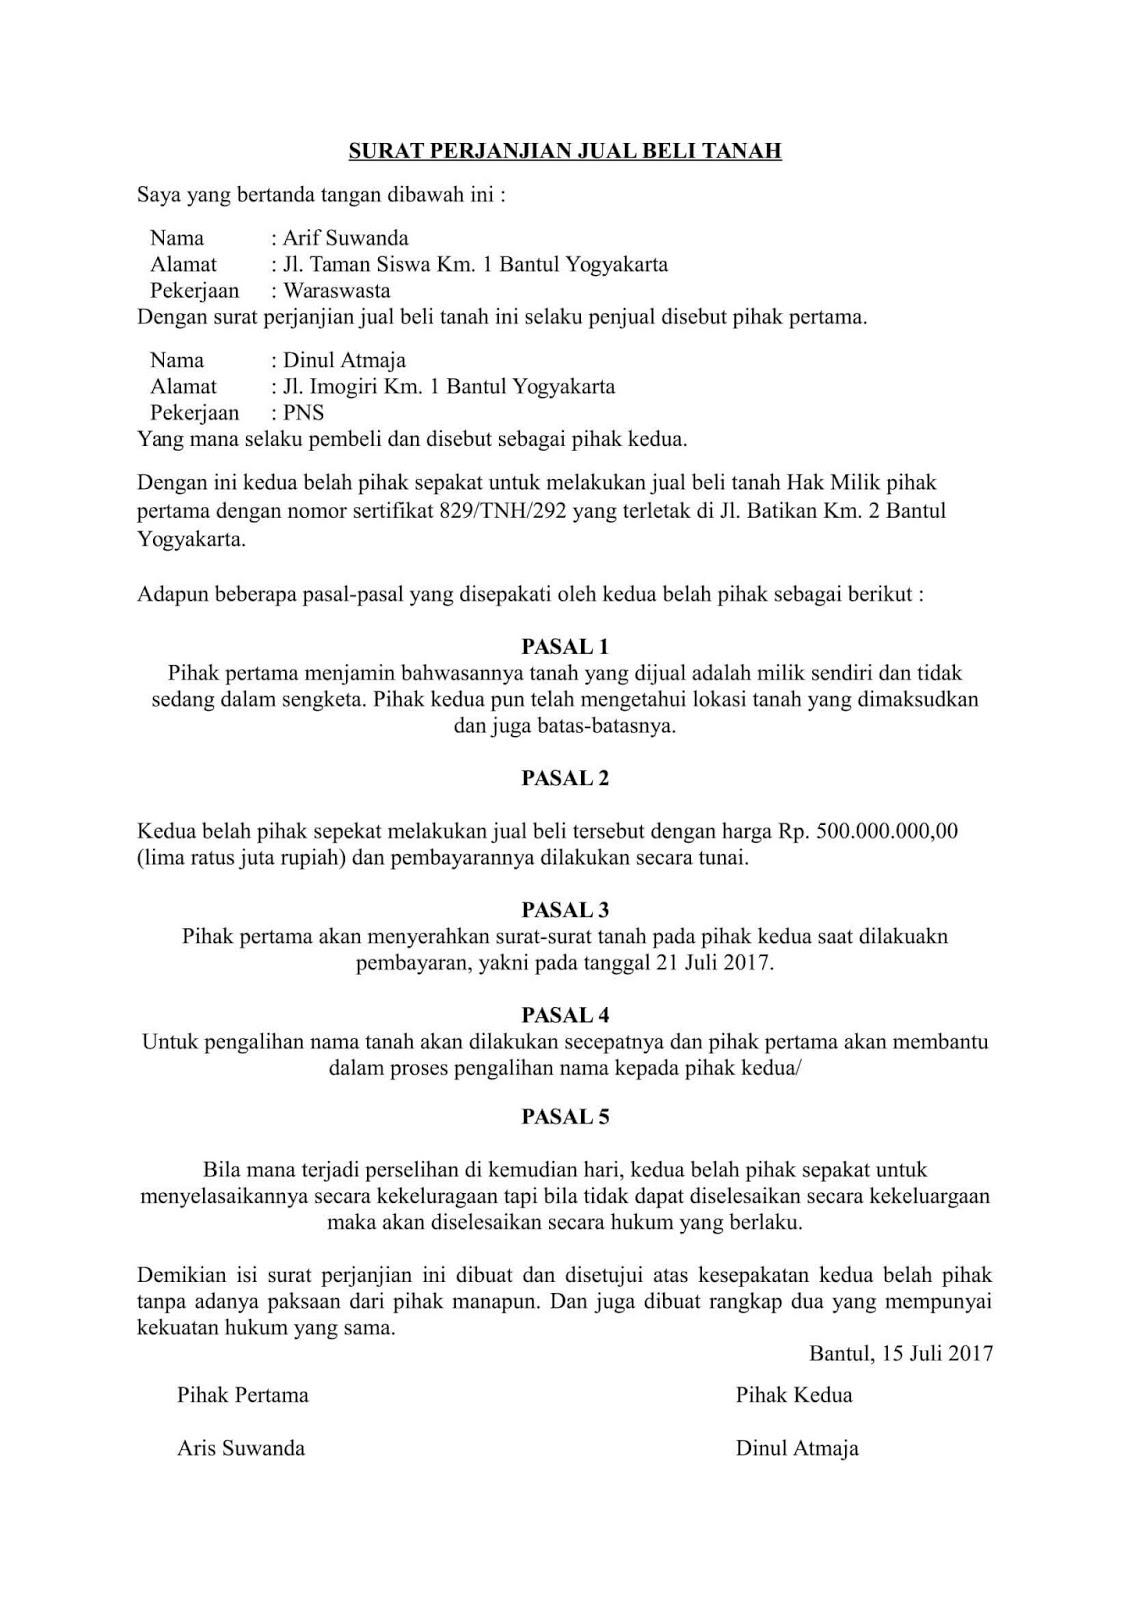 Contoh Surat Perjanjian Jual Beli Rumah Tunai